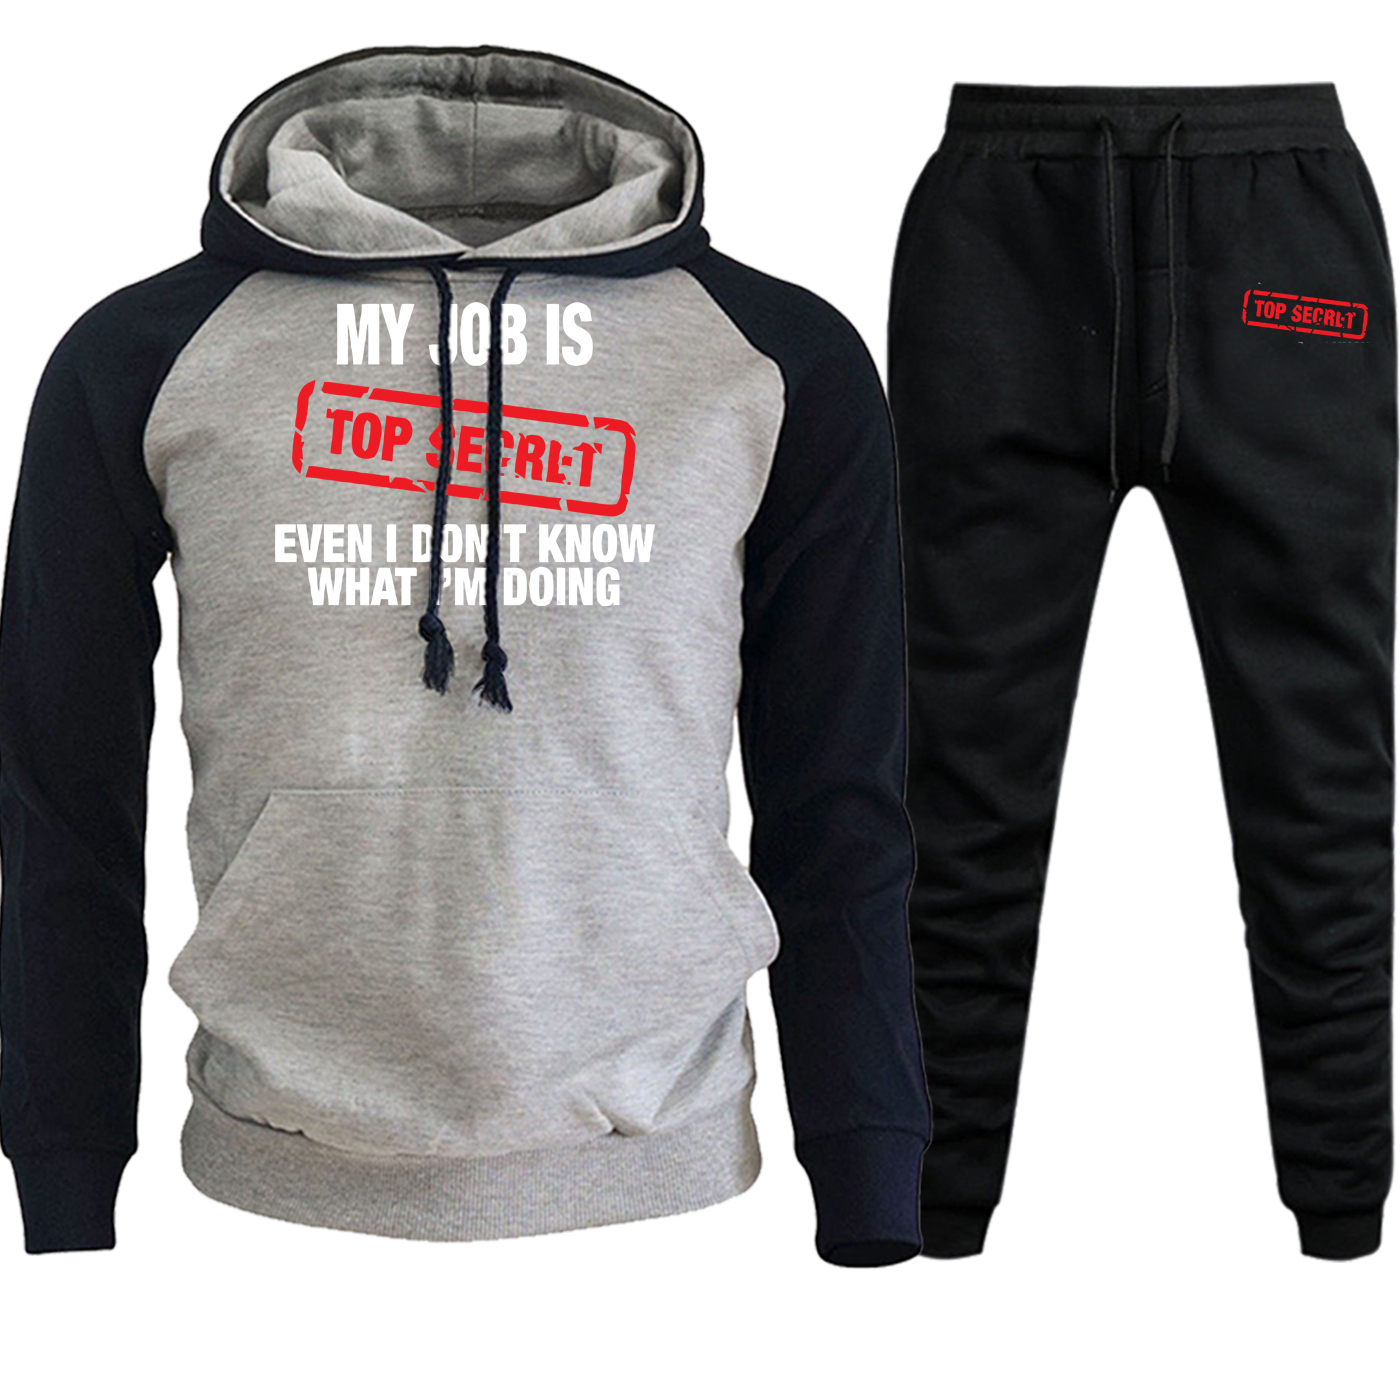 Funny My Job Is Top Secre Sportswear Mens Raglan Hoodies Autumn Winter Suit Men Casual Hooded Fleece Pullover+Pants 2 Piece Set